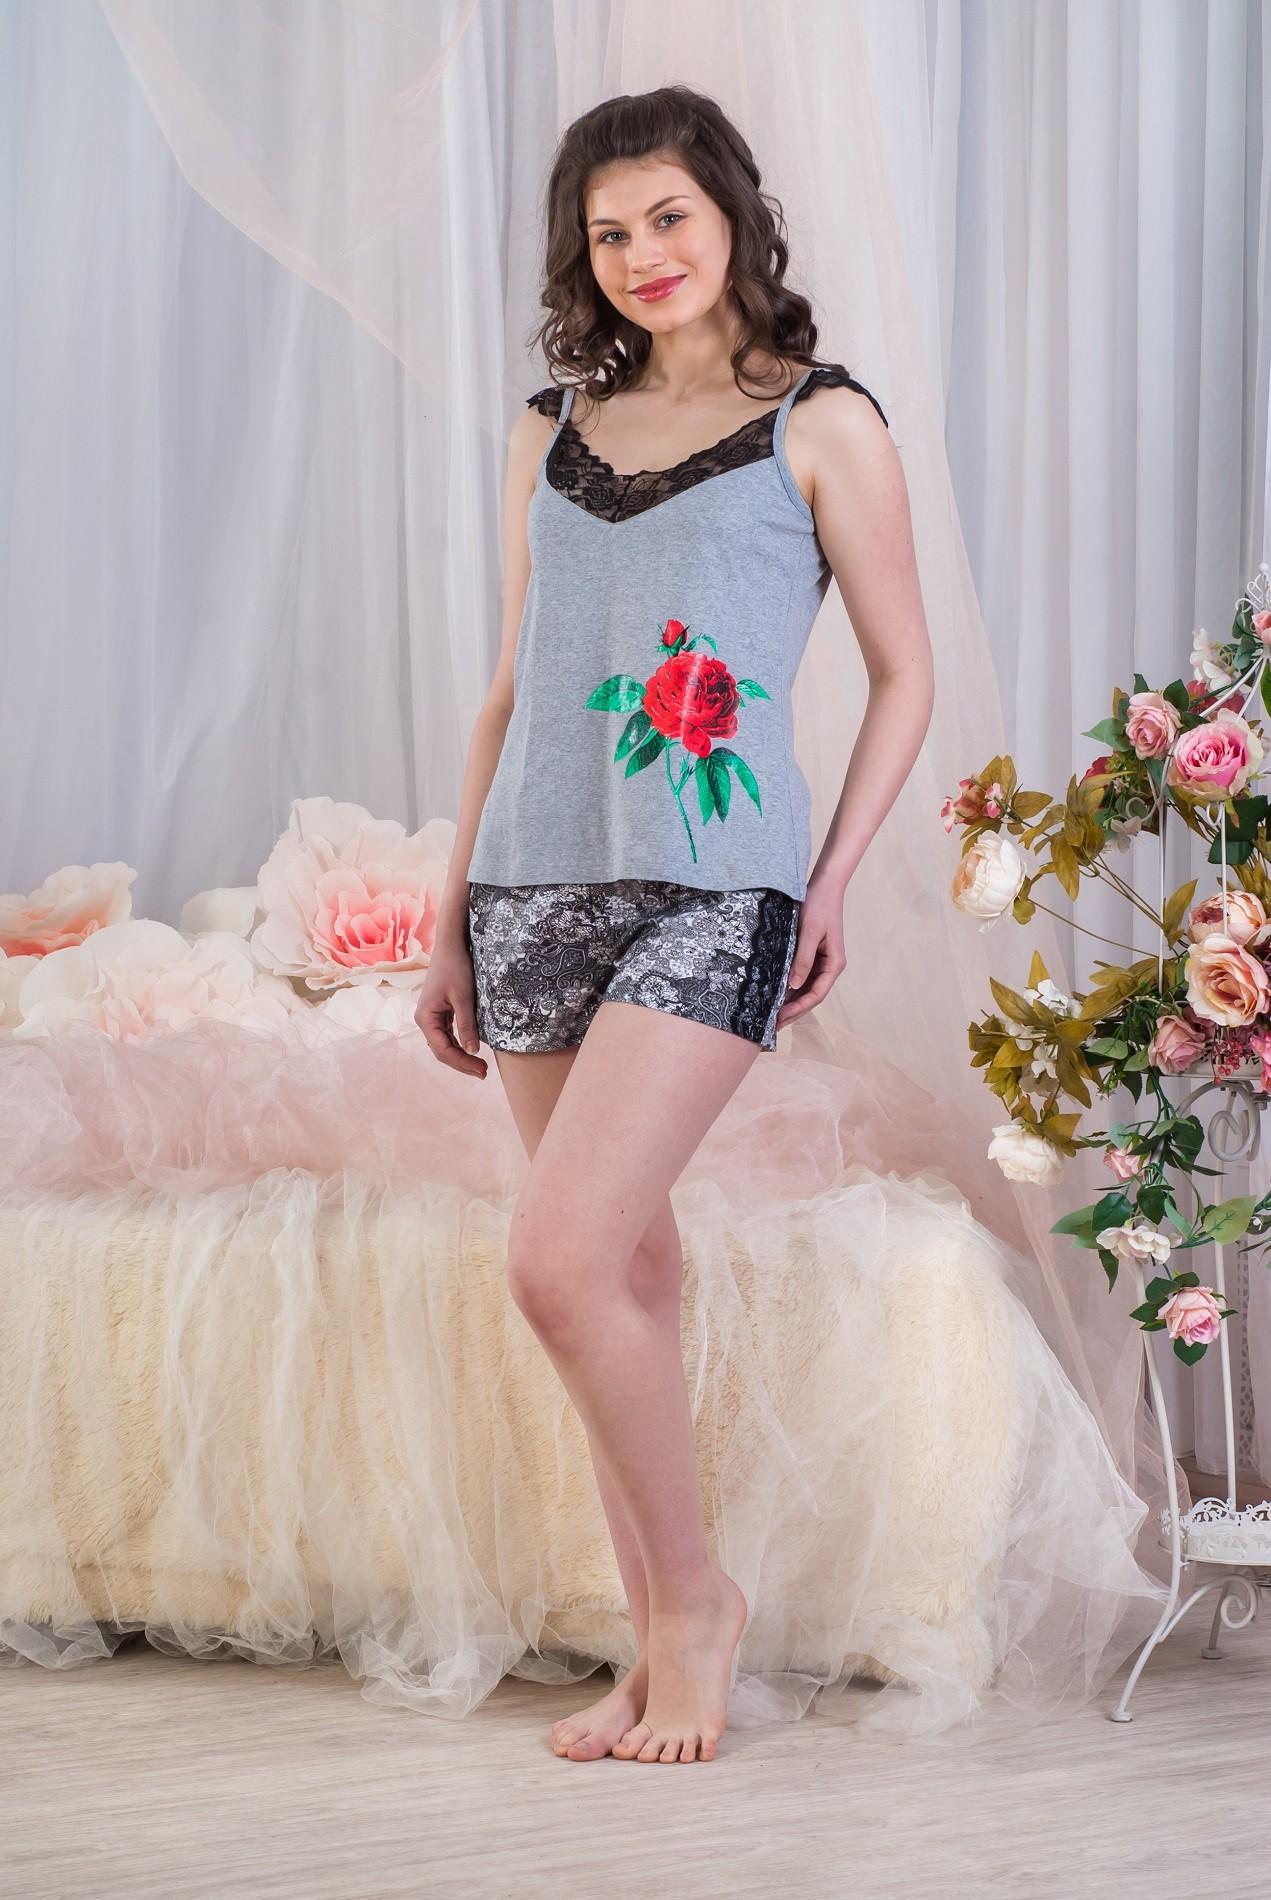 Пижама женская Узоры майка и шортыДомашняя одежда<br><br><br>Размер: 46